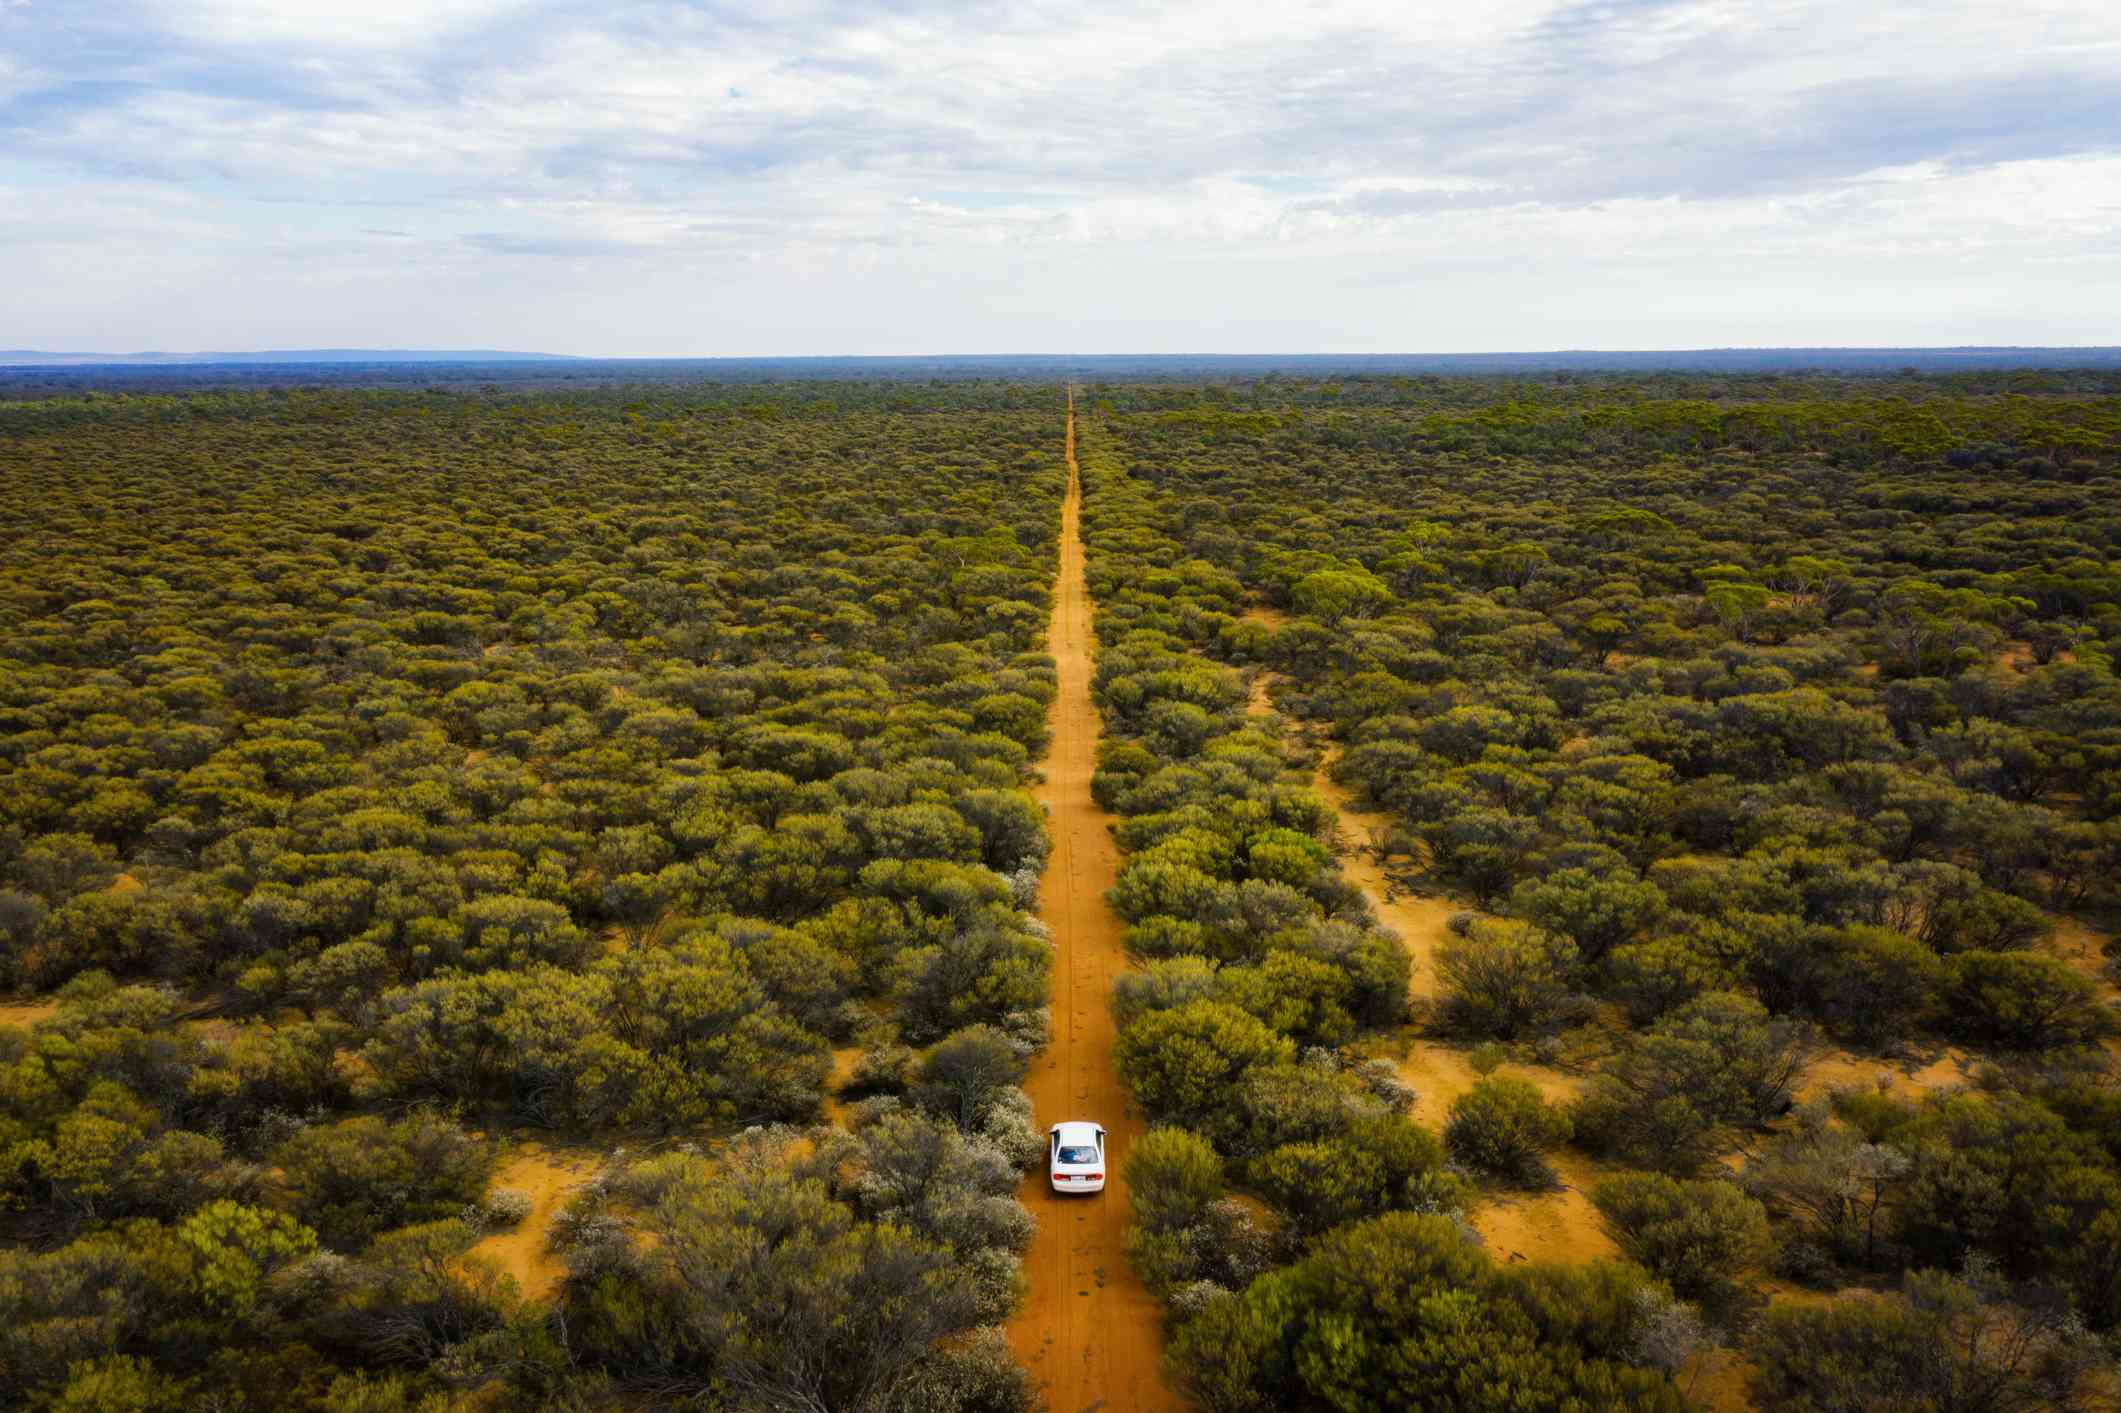 Driving through the bush land